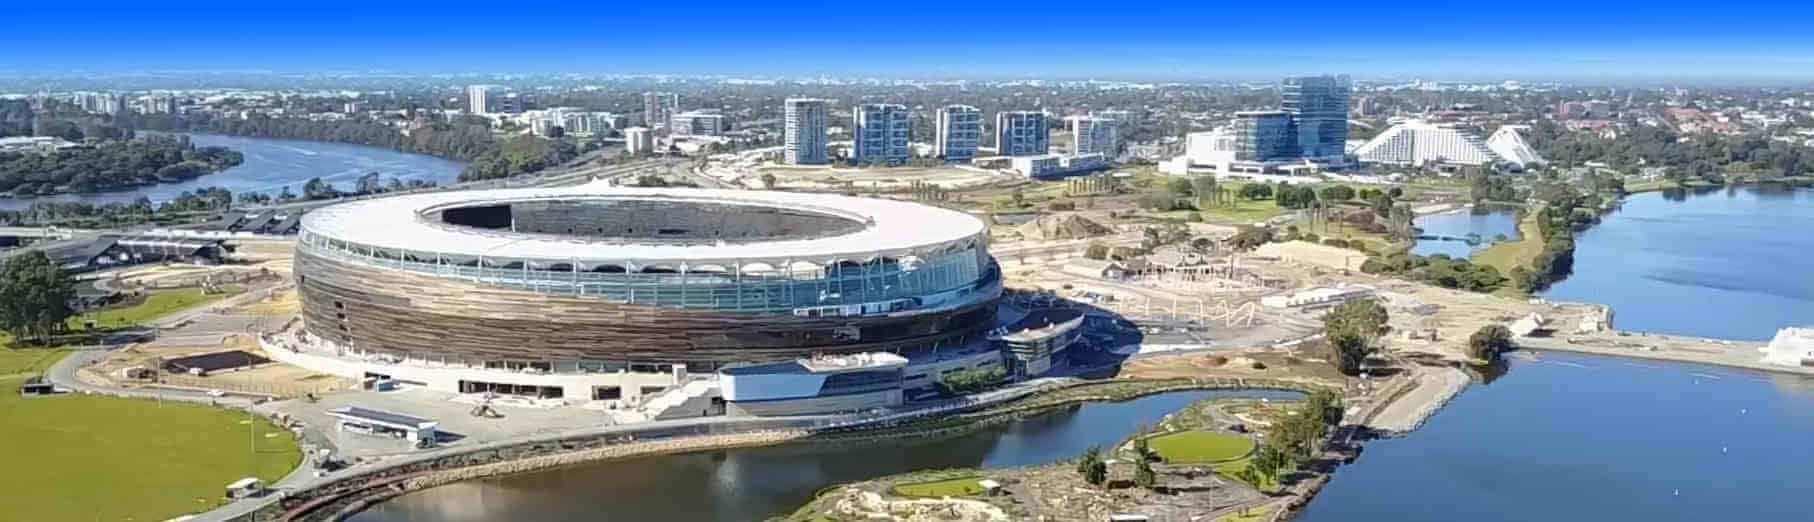 Hotels Near Optus Perth Stadium Booking hotel, Perth